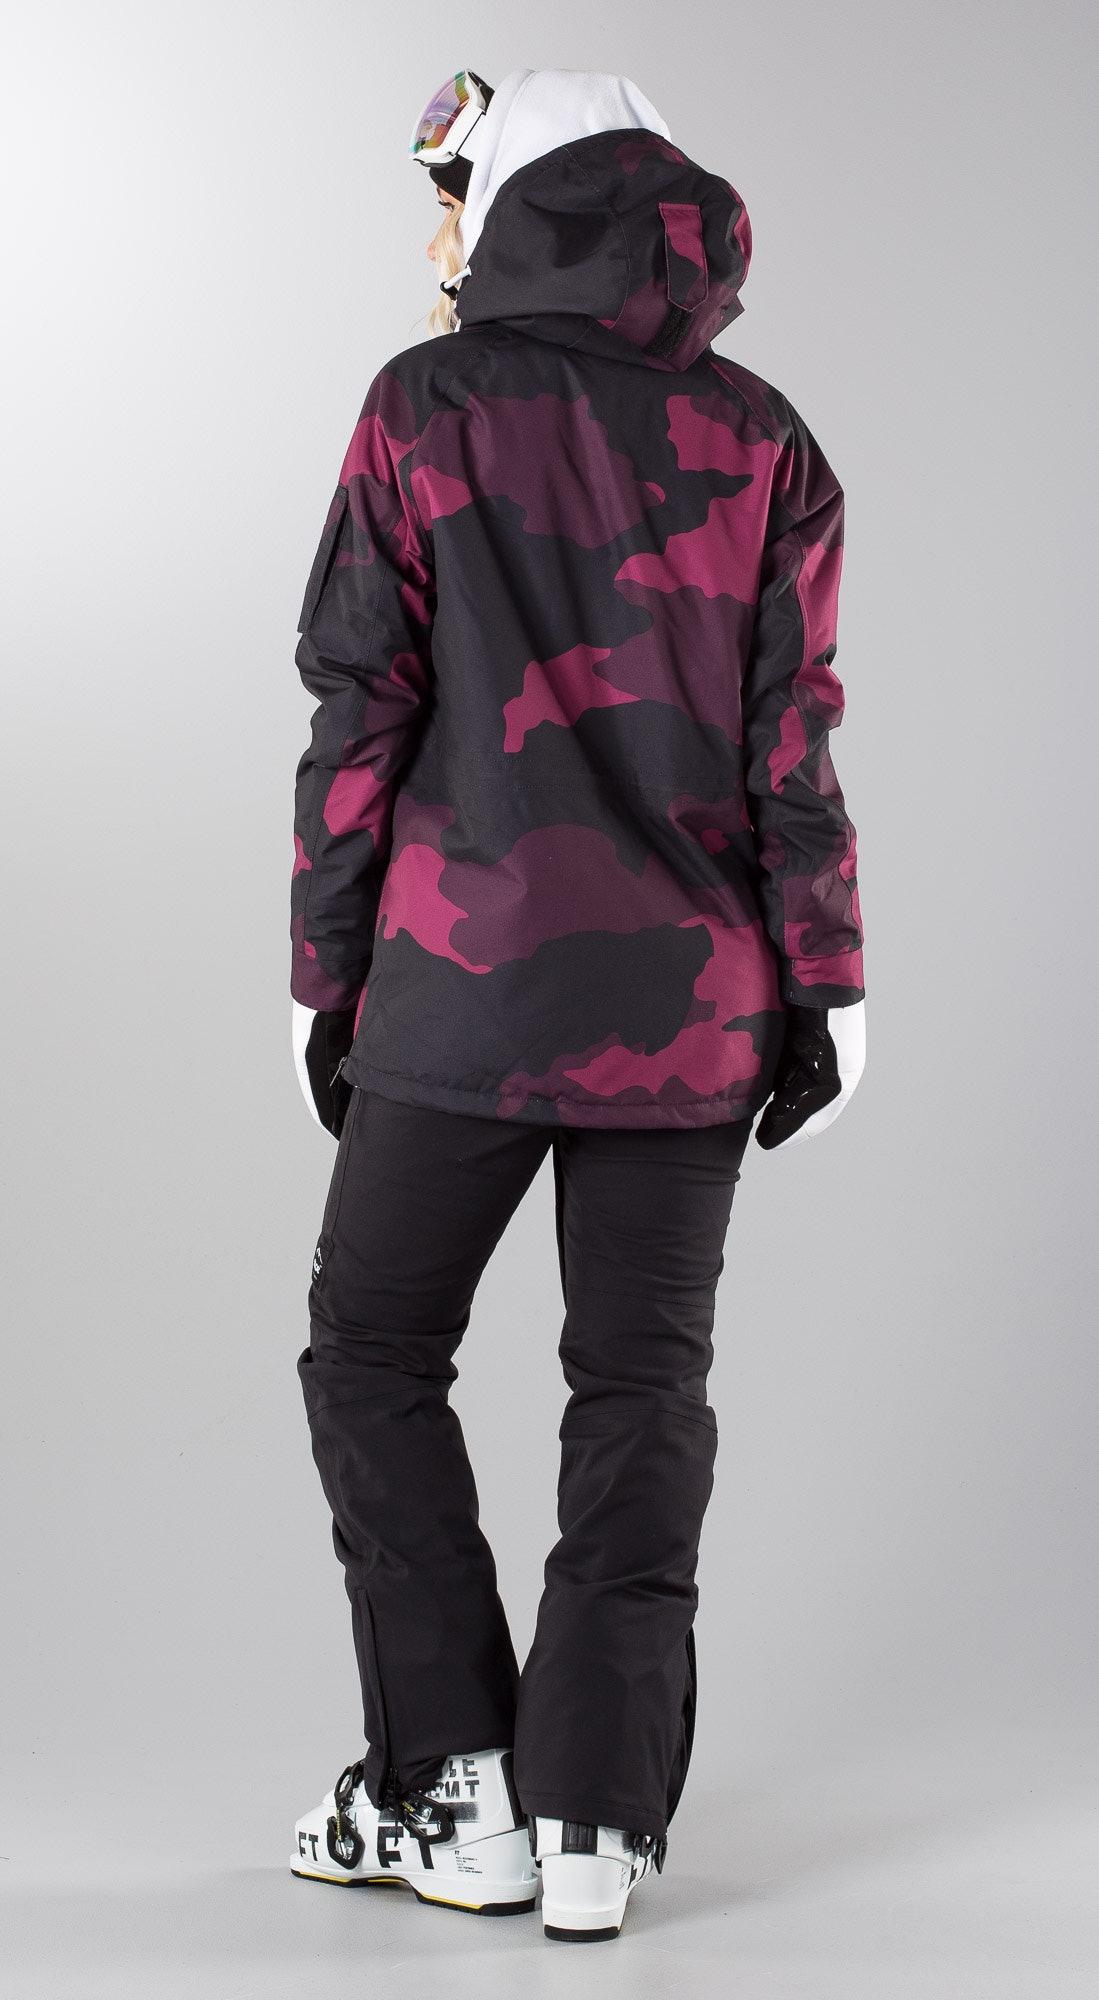 0eac4d348366 Dope Annok Purple Camo Skidkläder - Ridestore